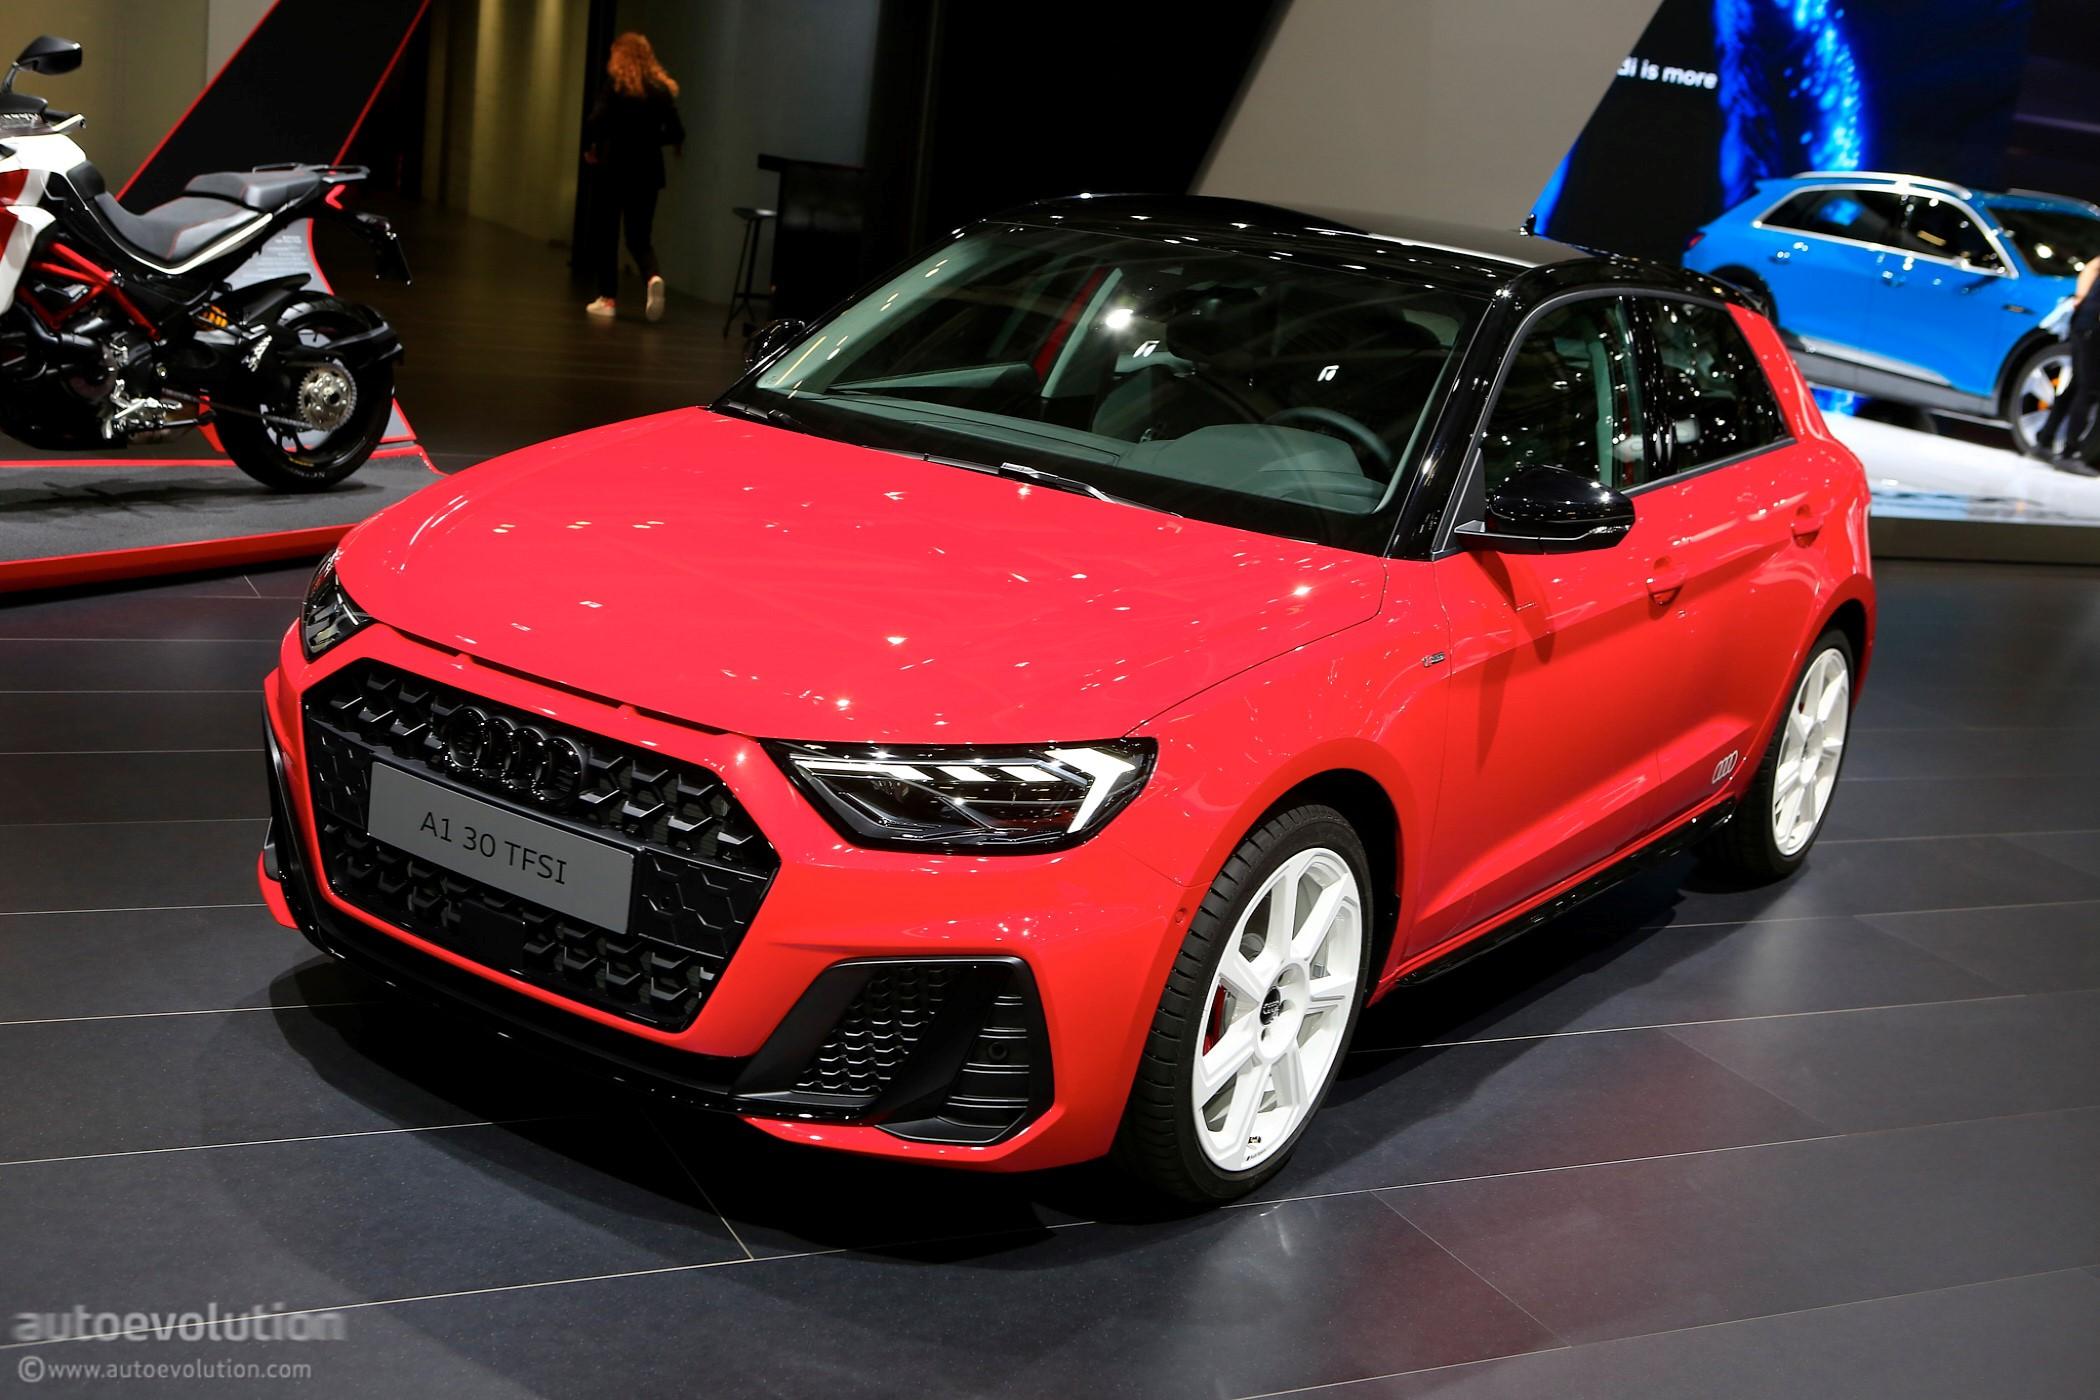 2018 Paris Motor Show New Audi A1 Sportback Looks Very Premium